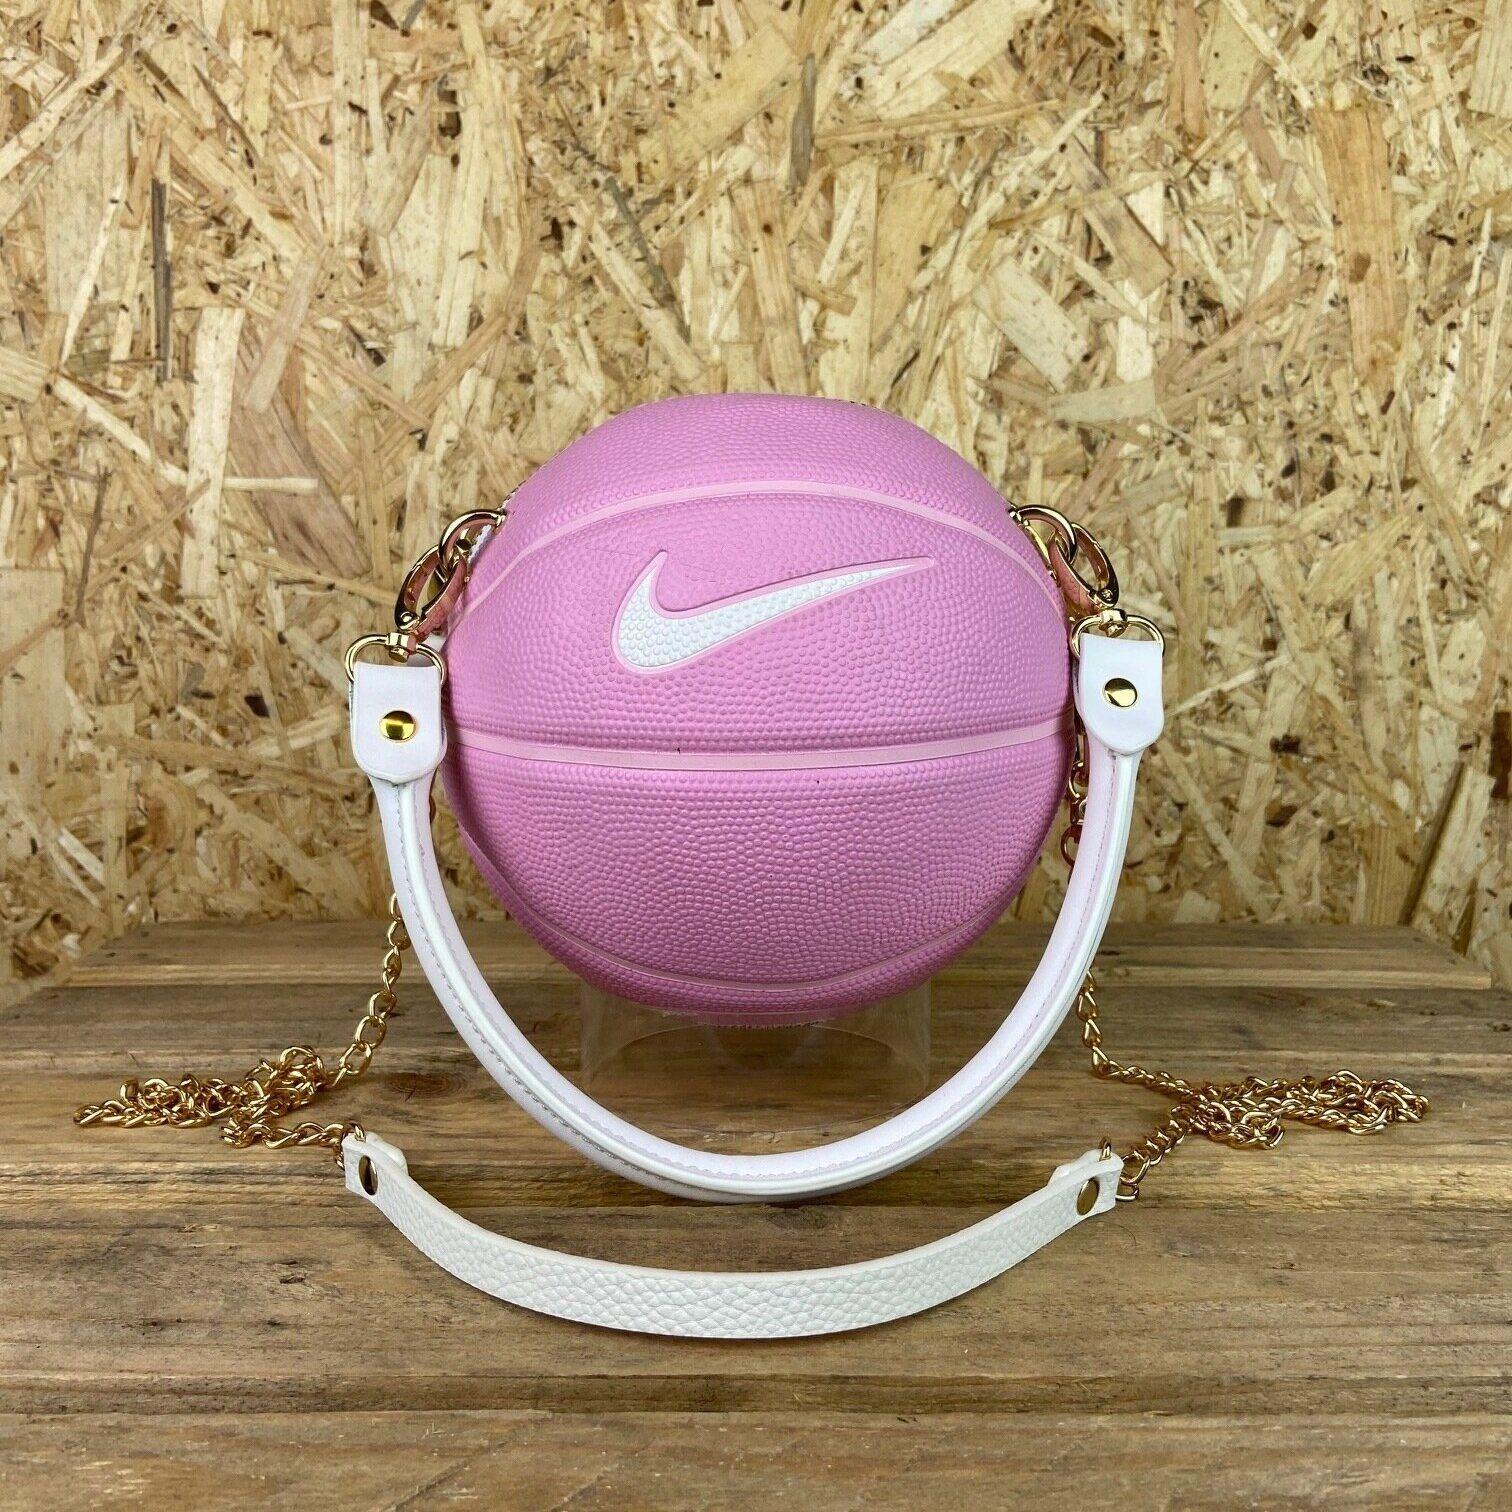 3.0 Basketball Bag - Nike Mini Size 3